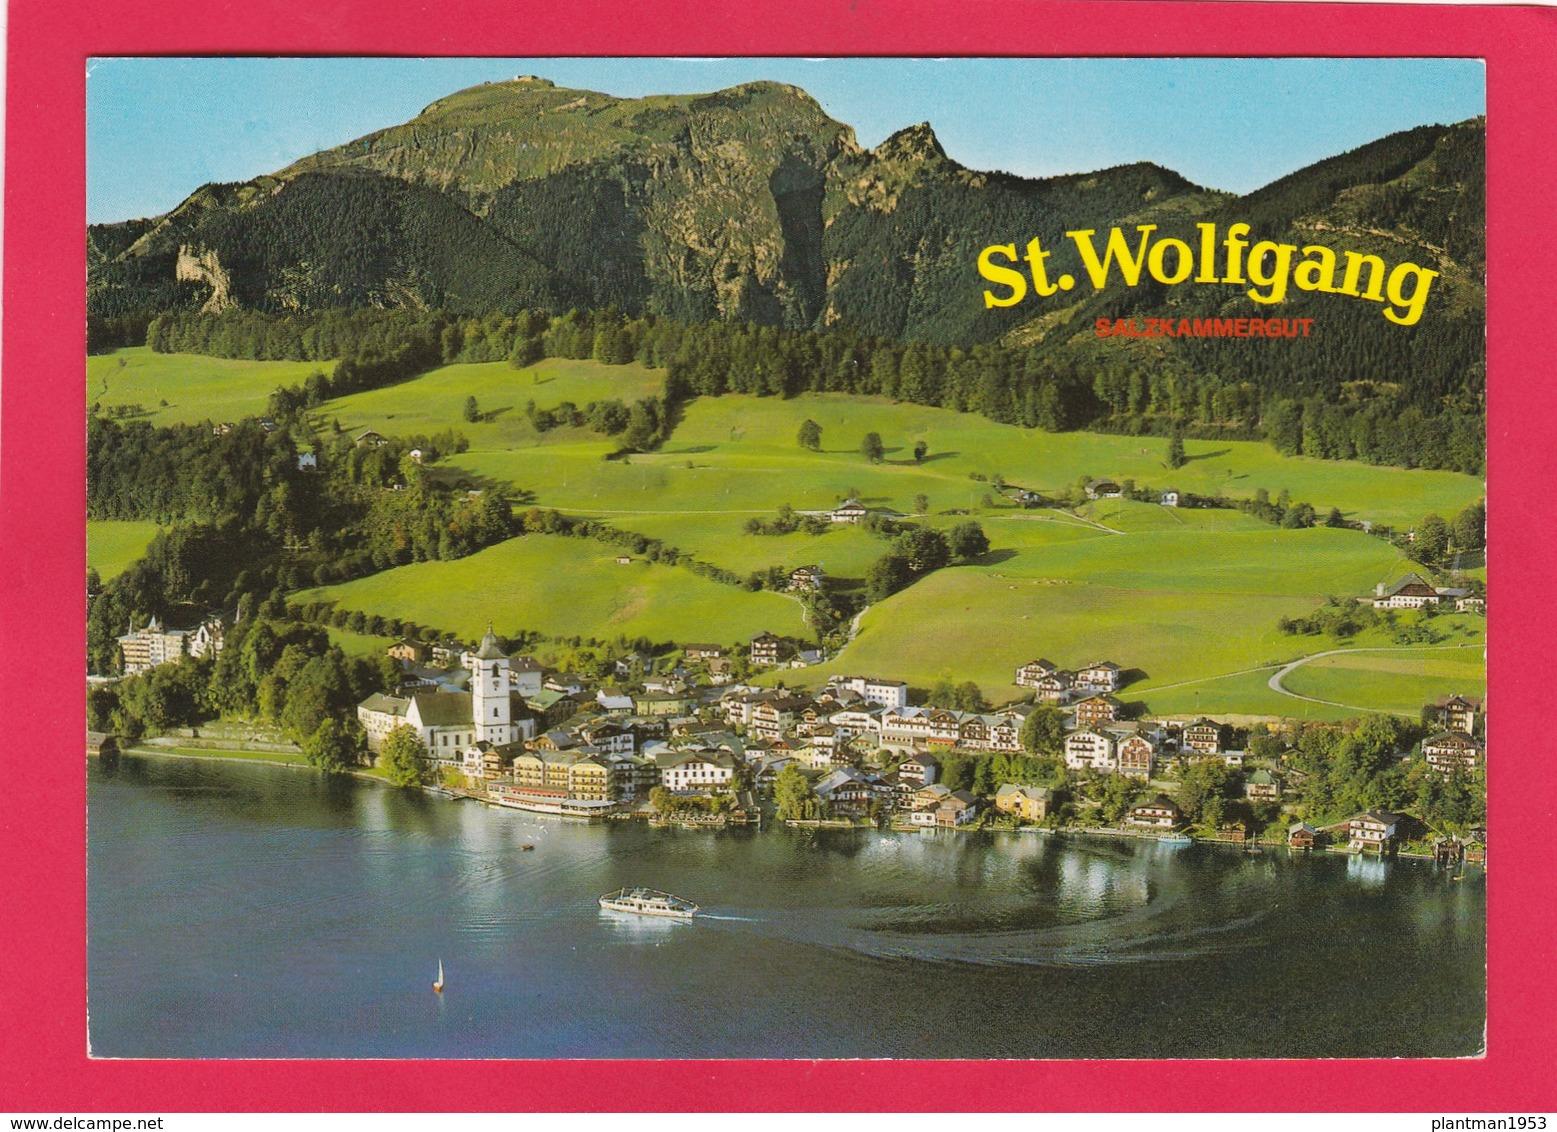 Modern Post Card Of St. Wolfgang,Higher-Austria, Austria,L52. - St. Wolfgang